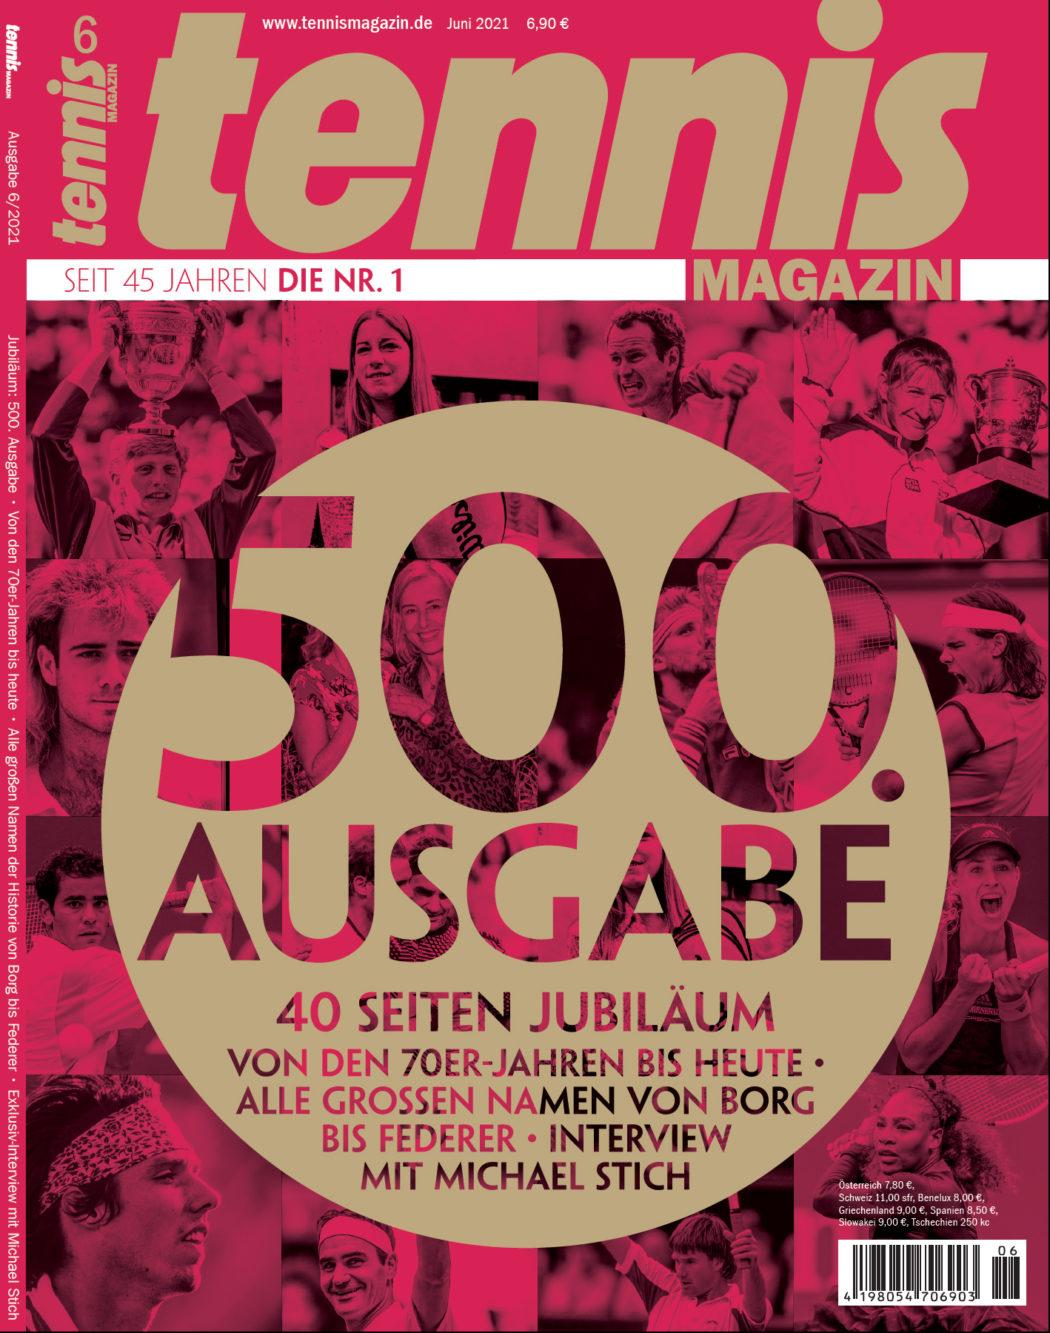 tennis magazin Studentenabo